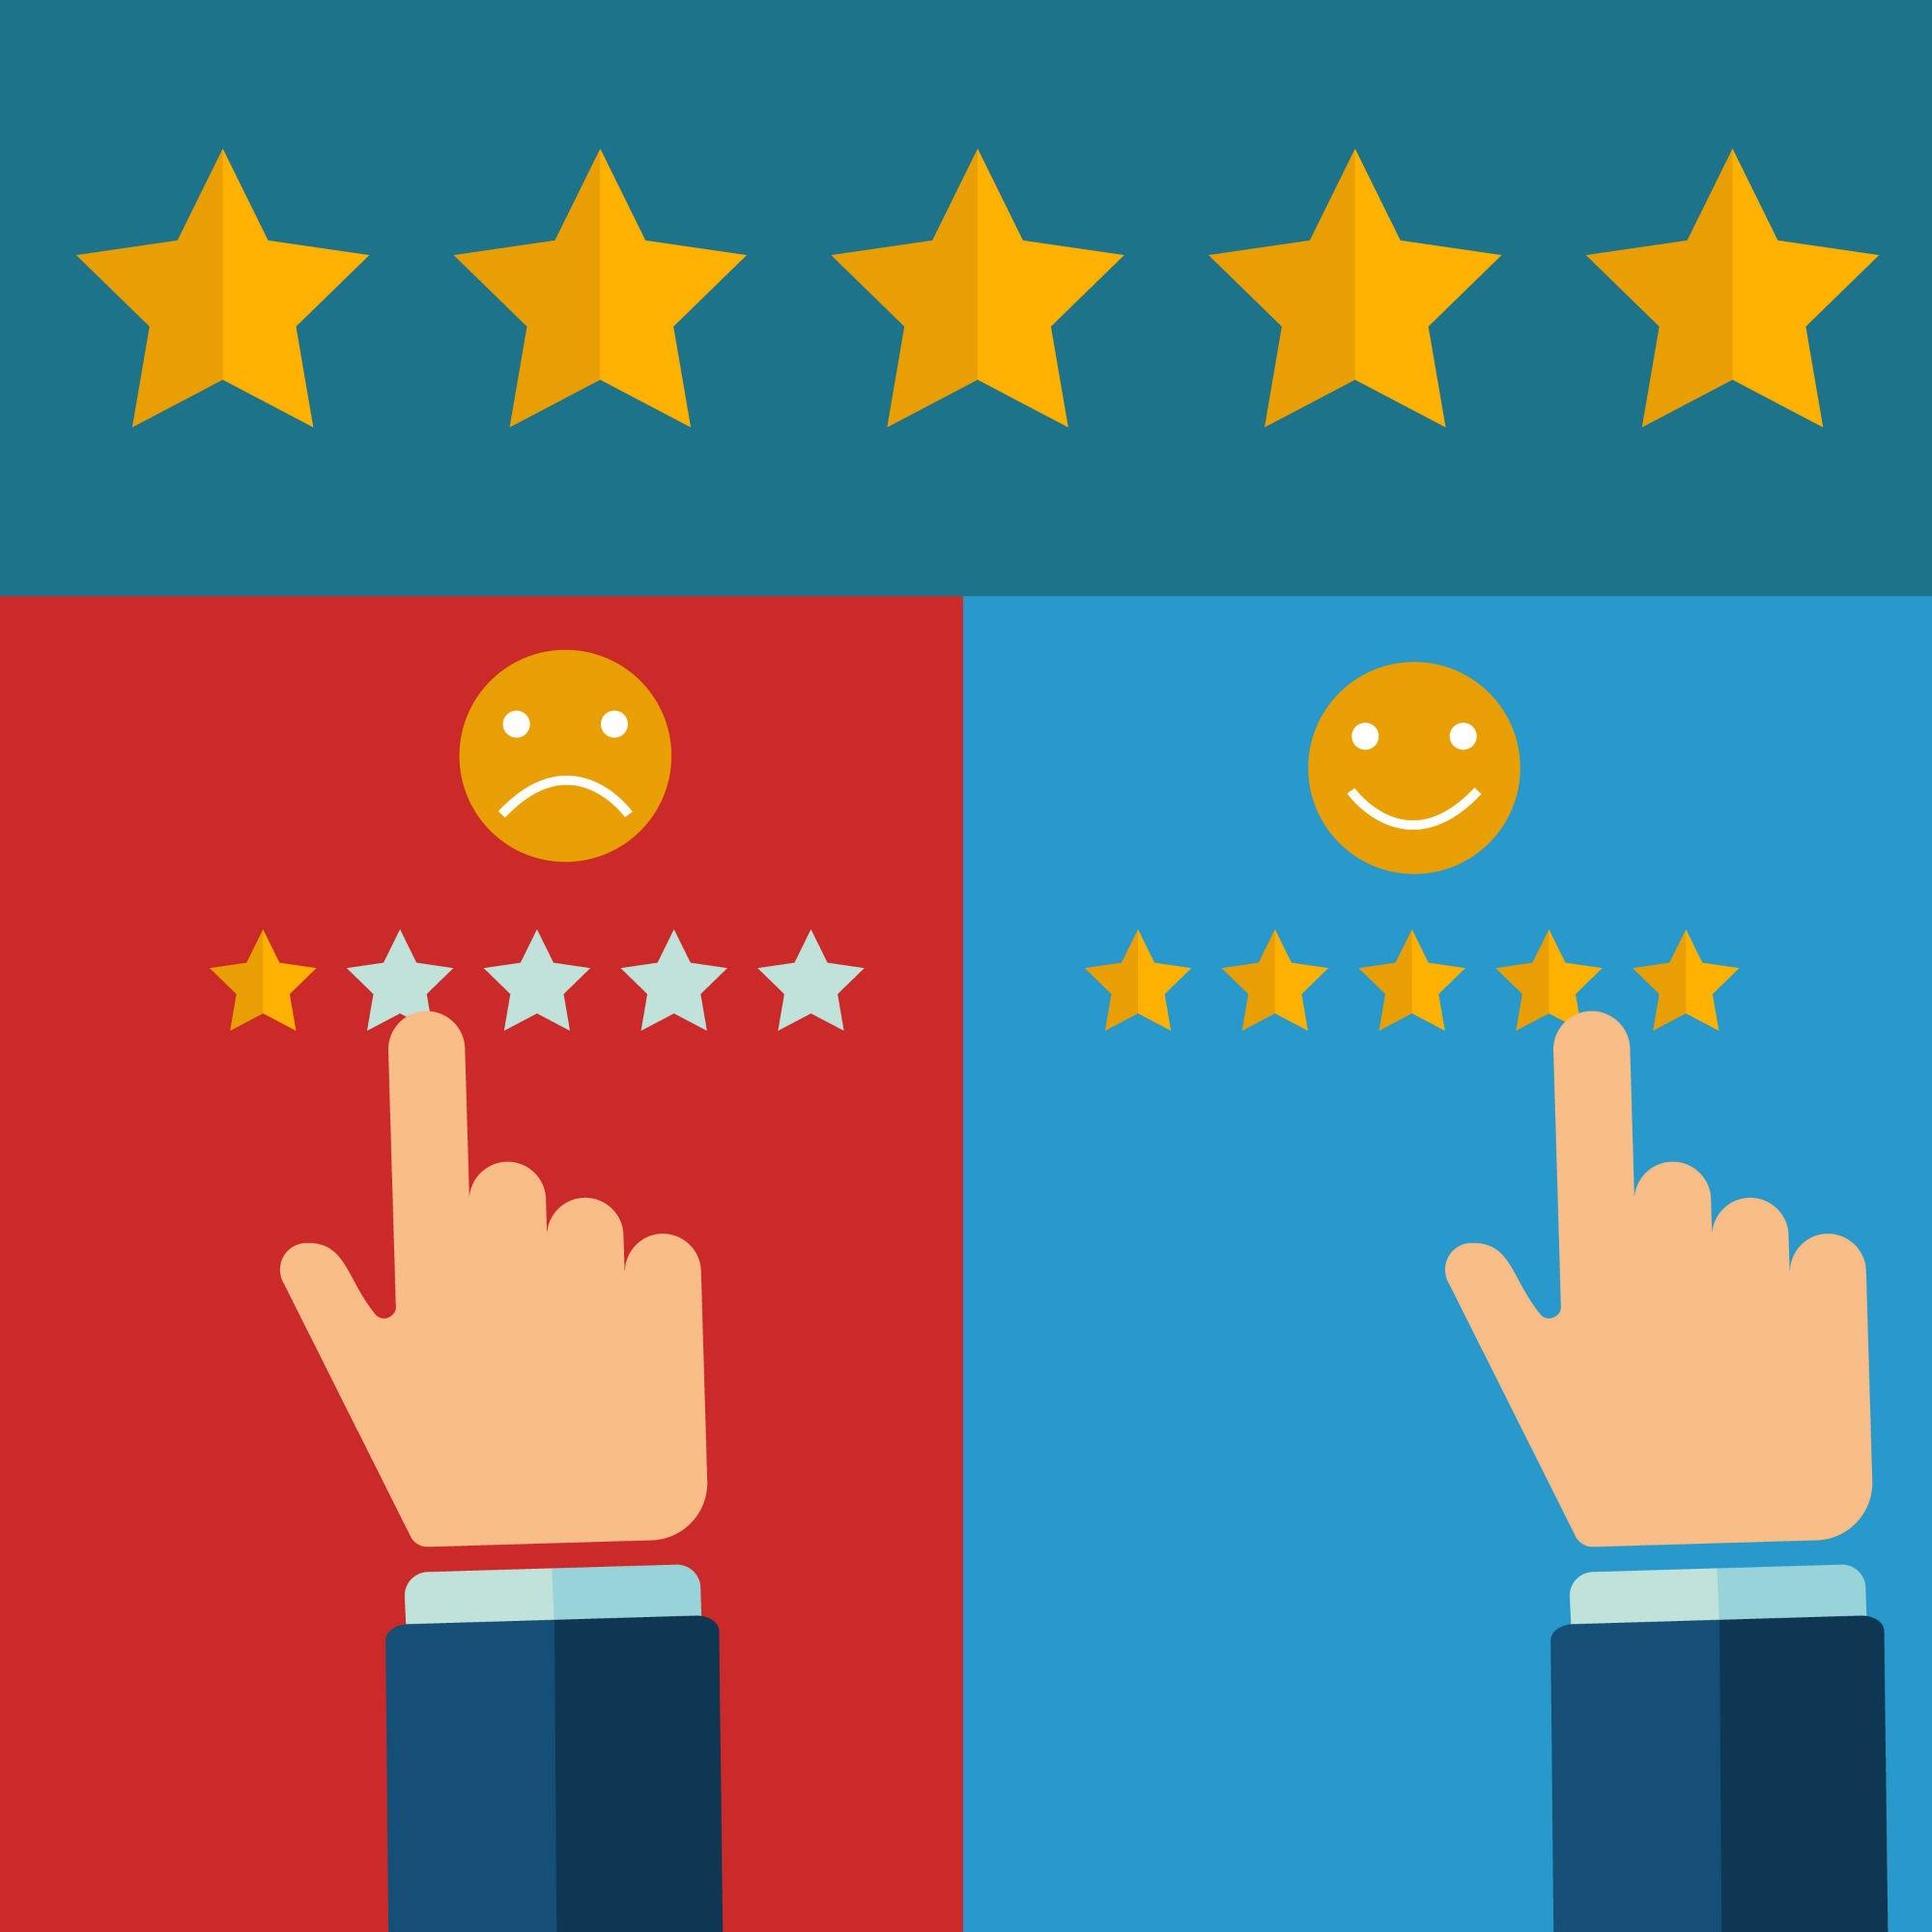 testimonial, review, stars, customer feedback